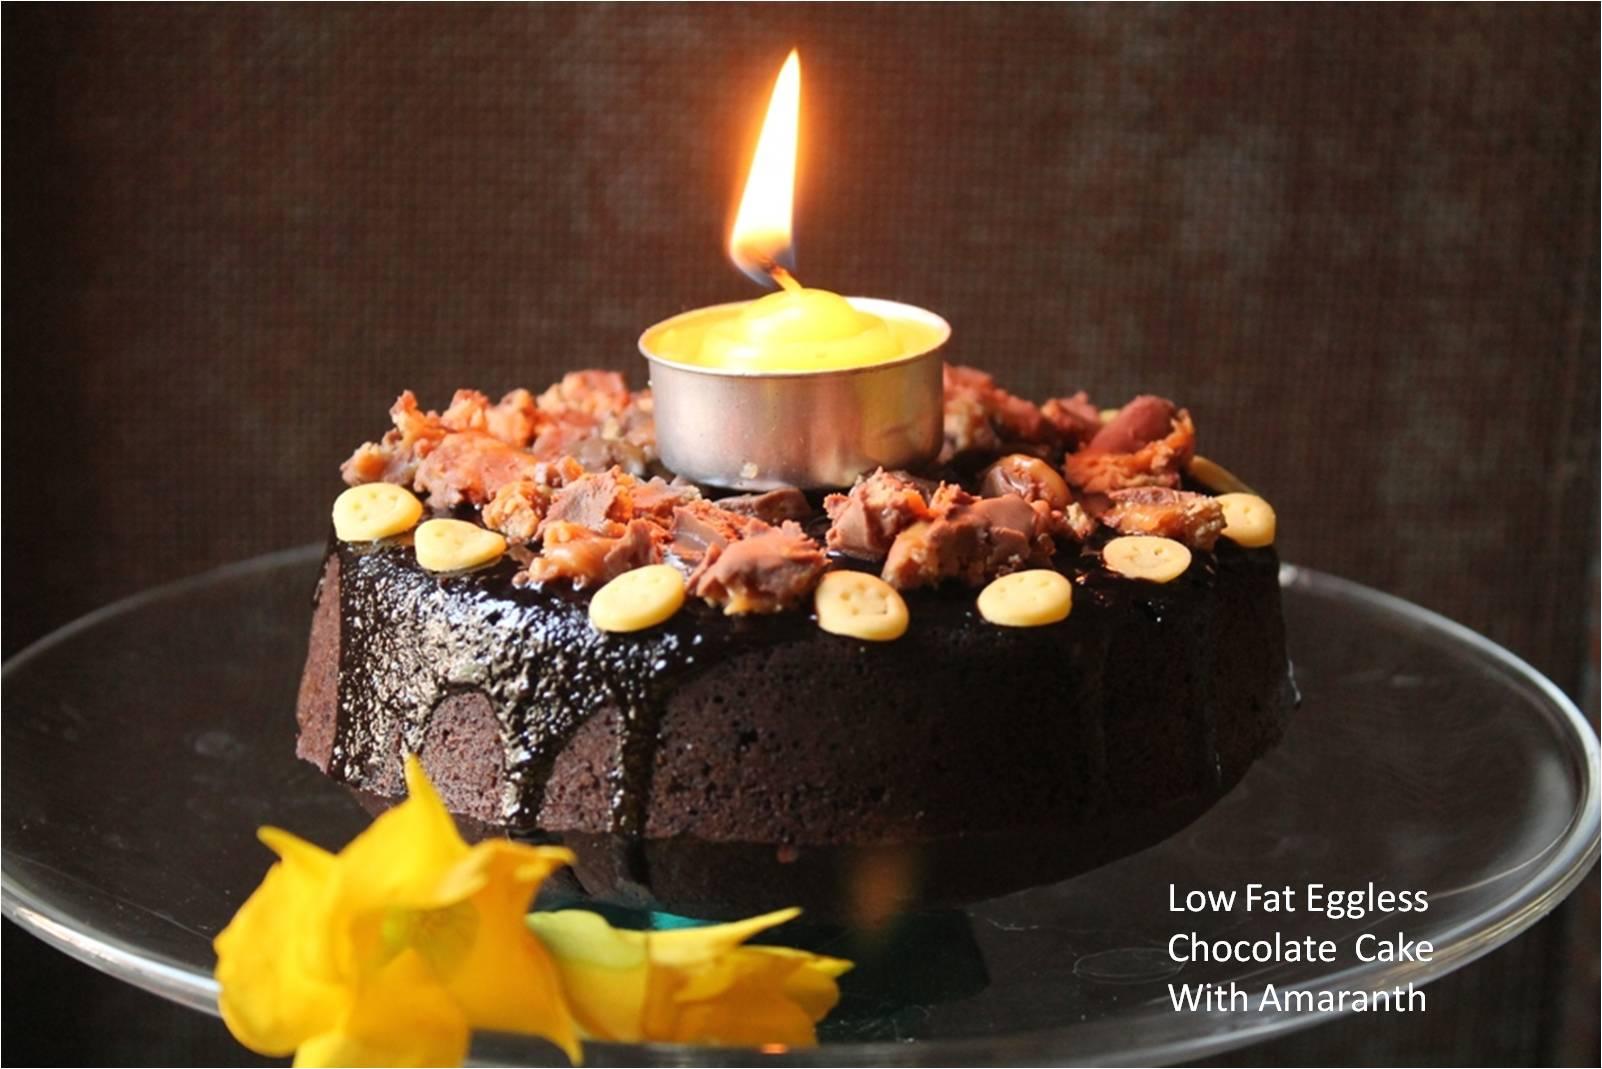 Eggless chocolate cake with amaranth flouru happy st anniversary